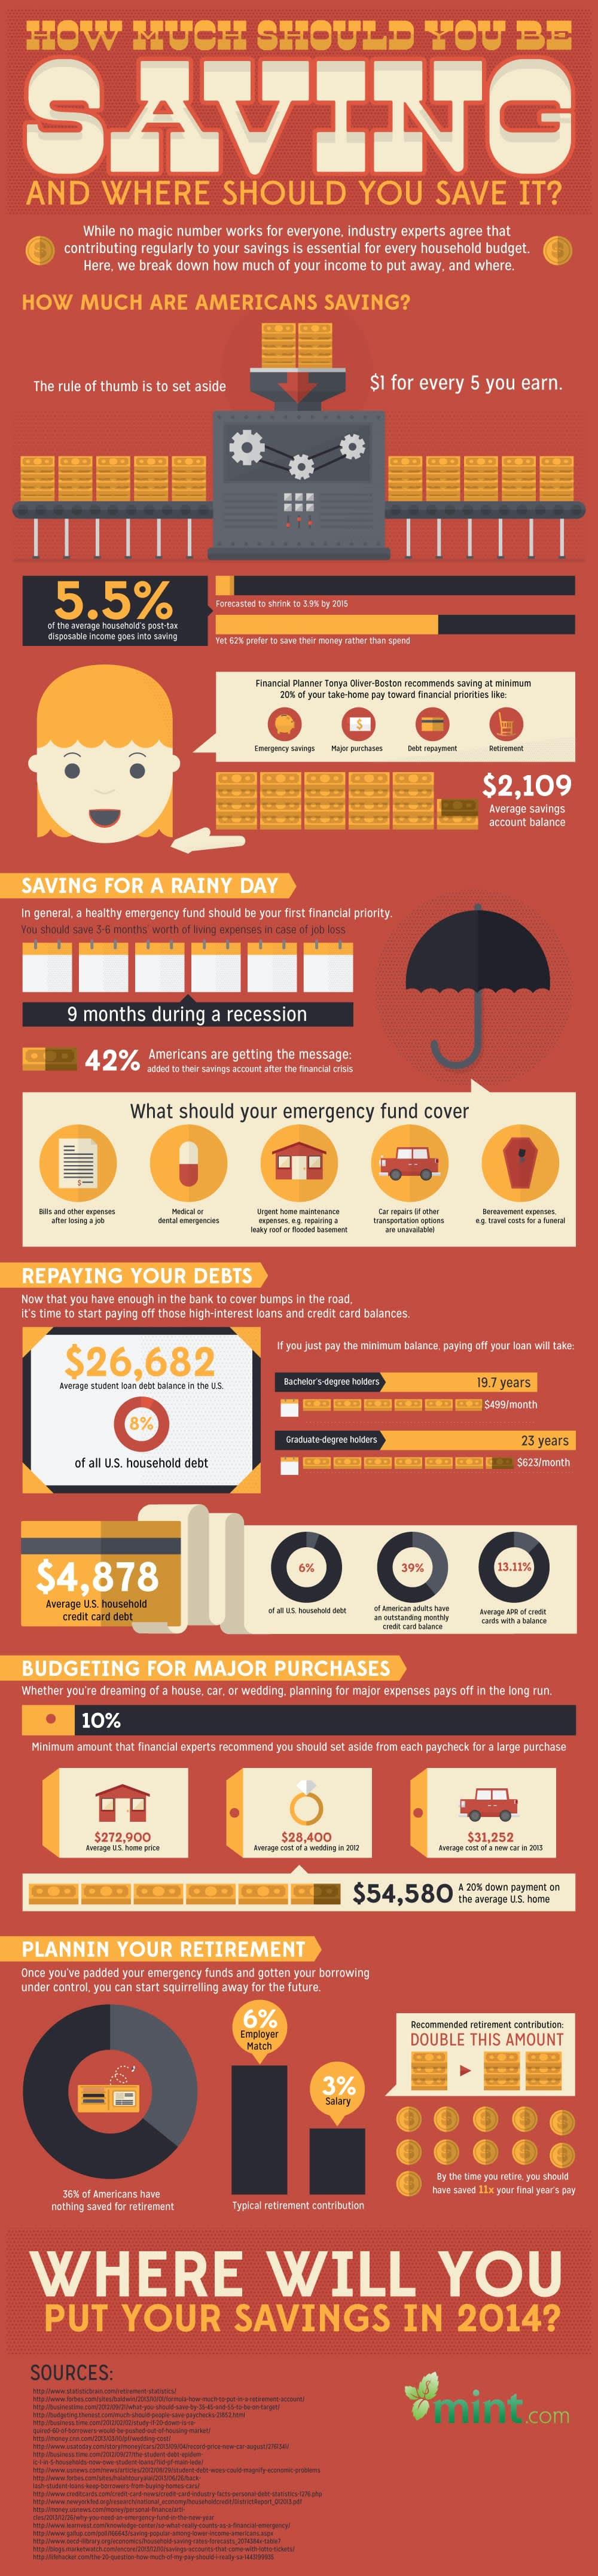 savings infographic